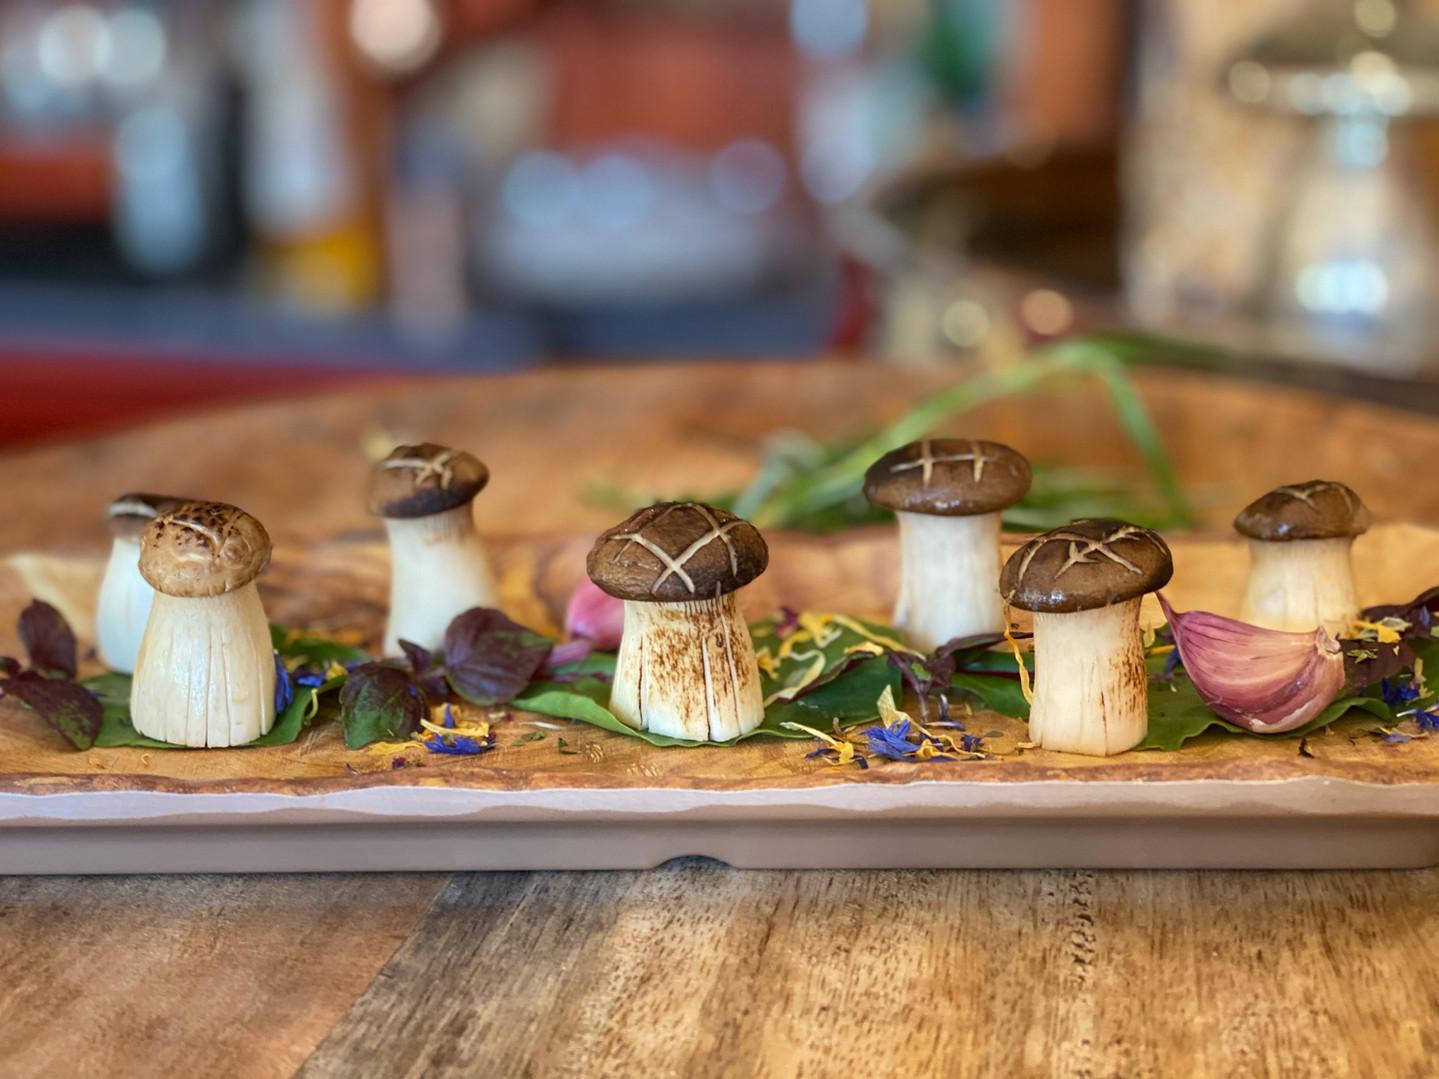 Pilze im Hotel Wegner - the culinary art hotel